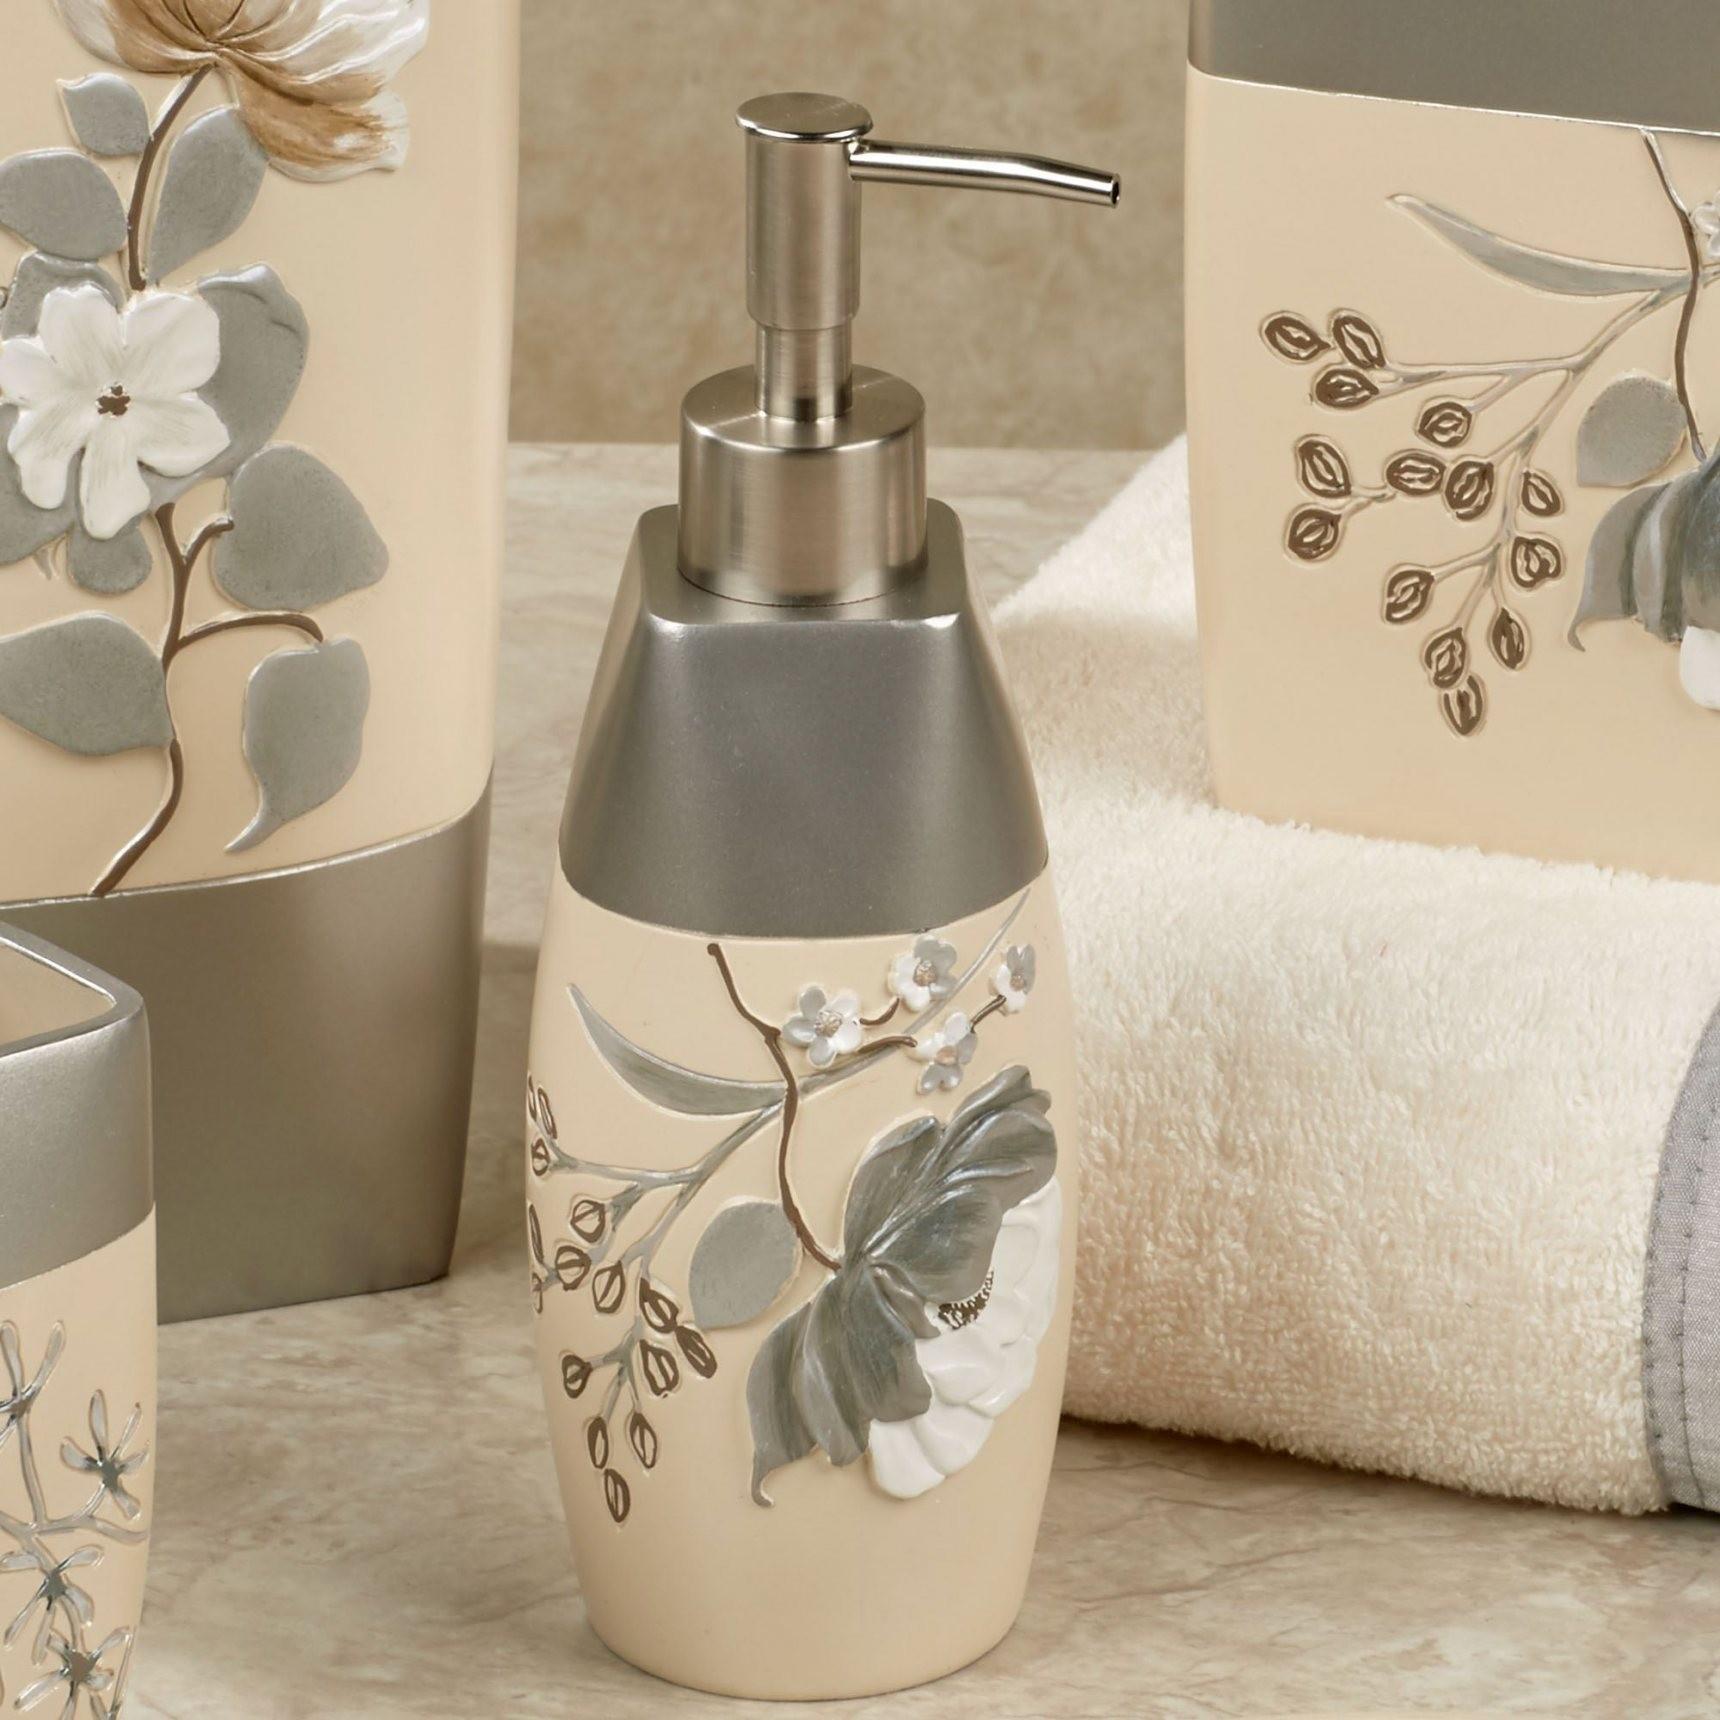 New Beige Bathroom Accessories Decoration Home Sweet Home Modern Livingroom